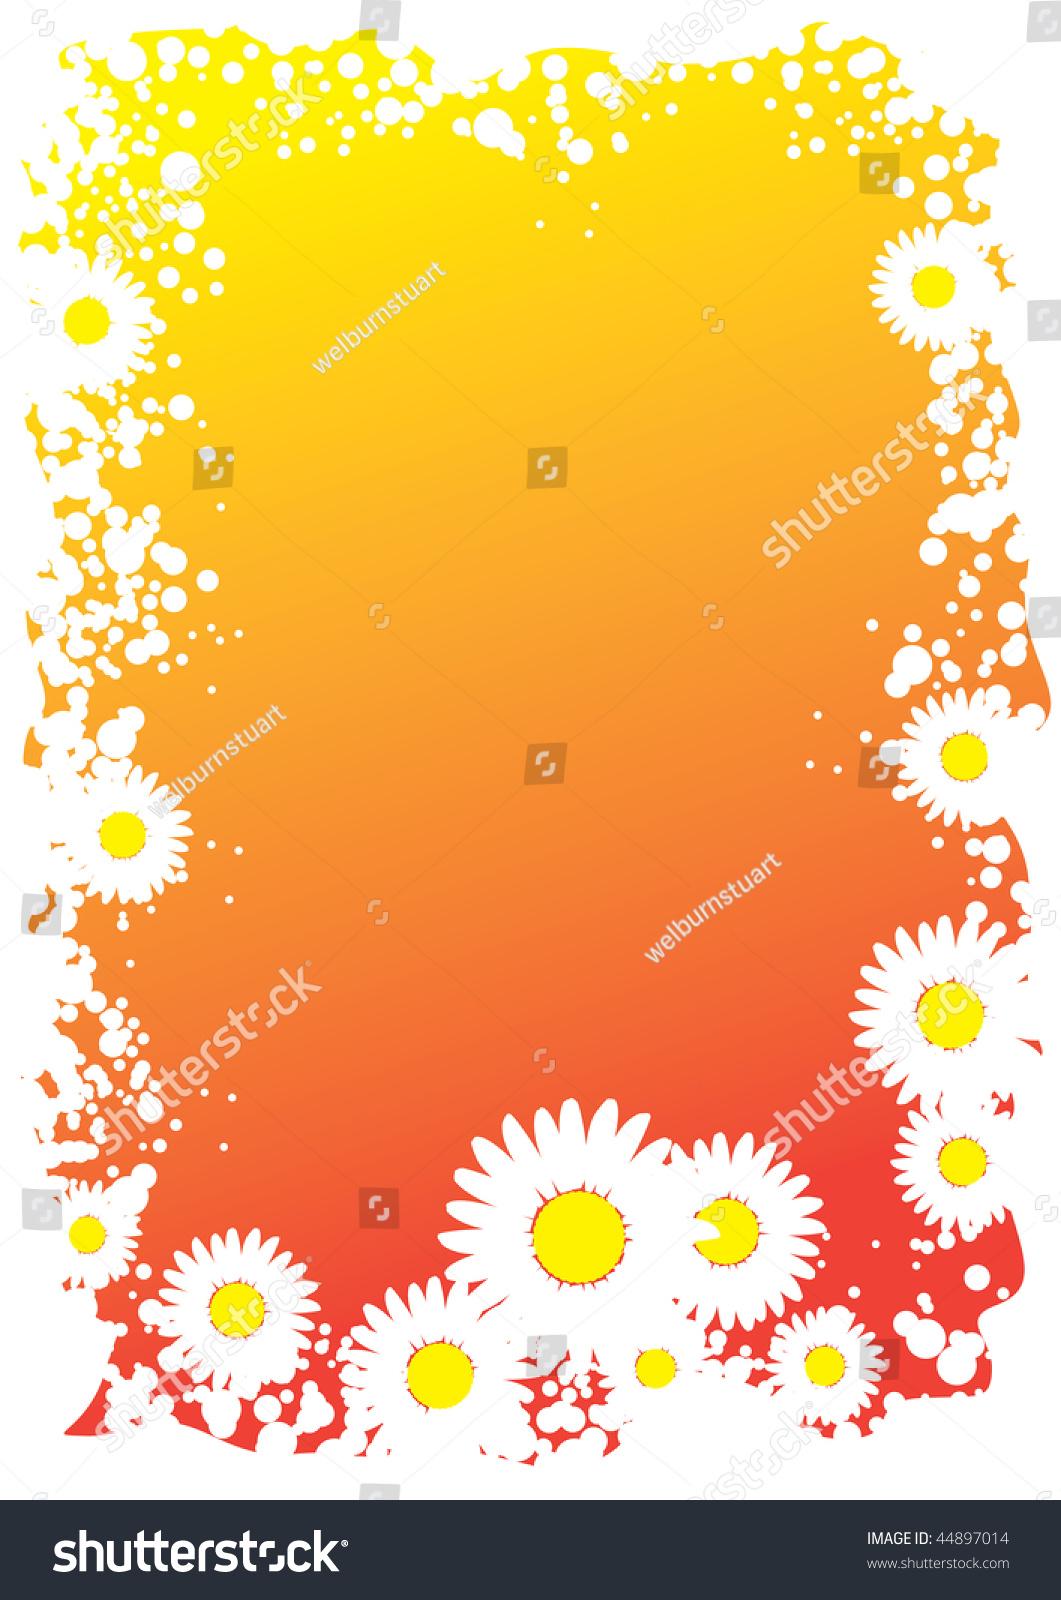 Daisy flower border stock vector 44897014 shutterstock daisy flower border izmirmasajfo